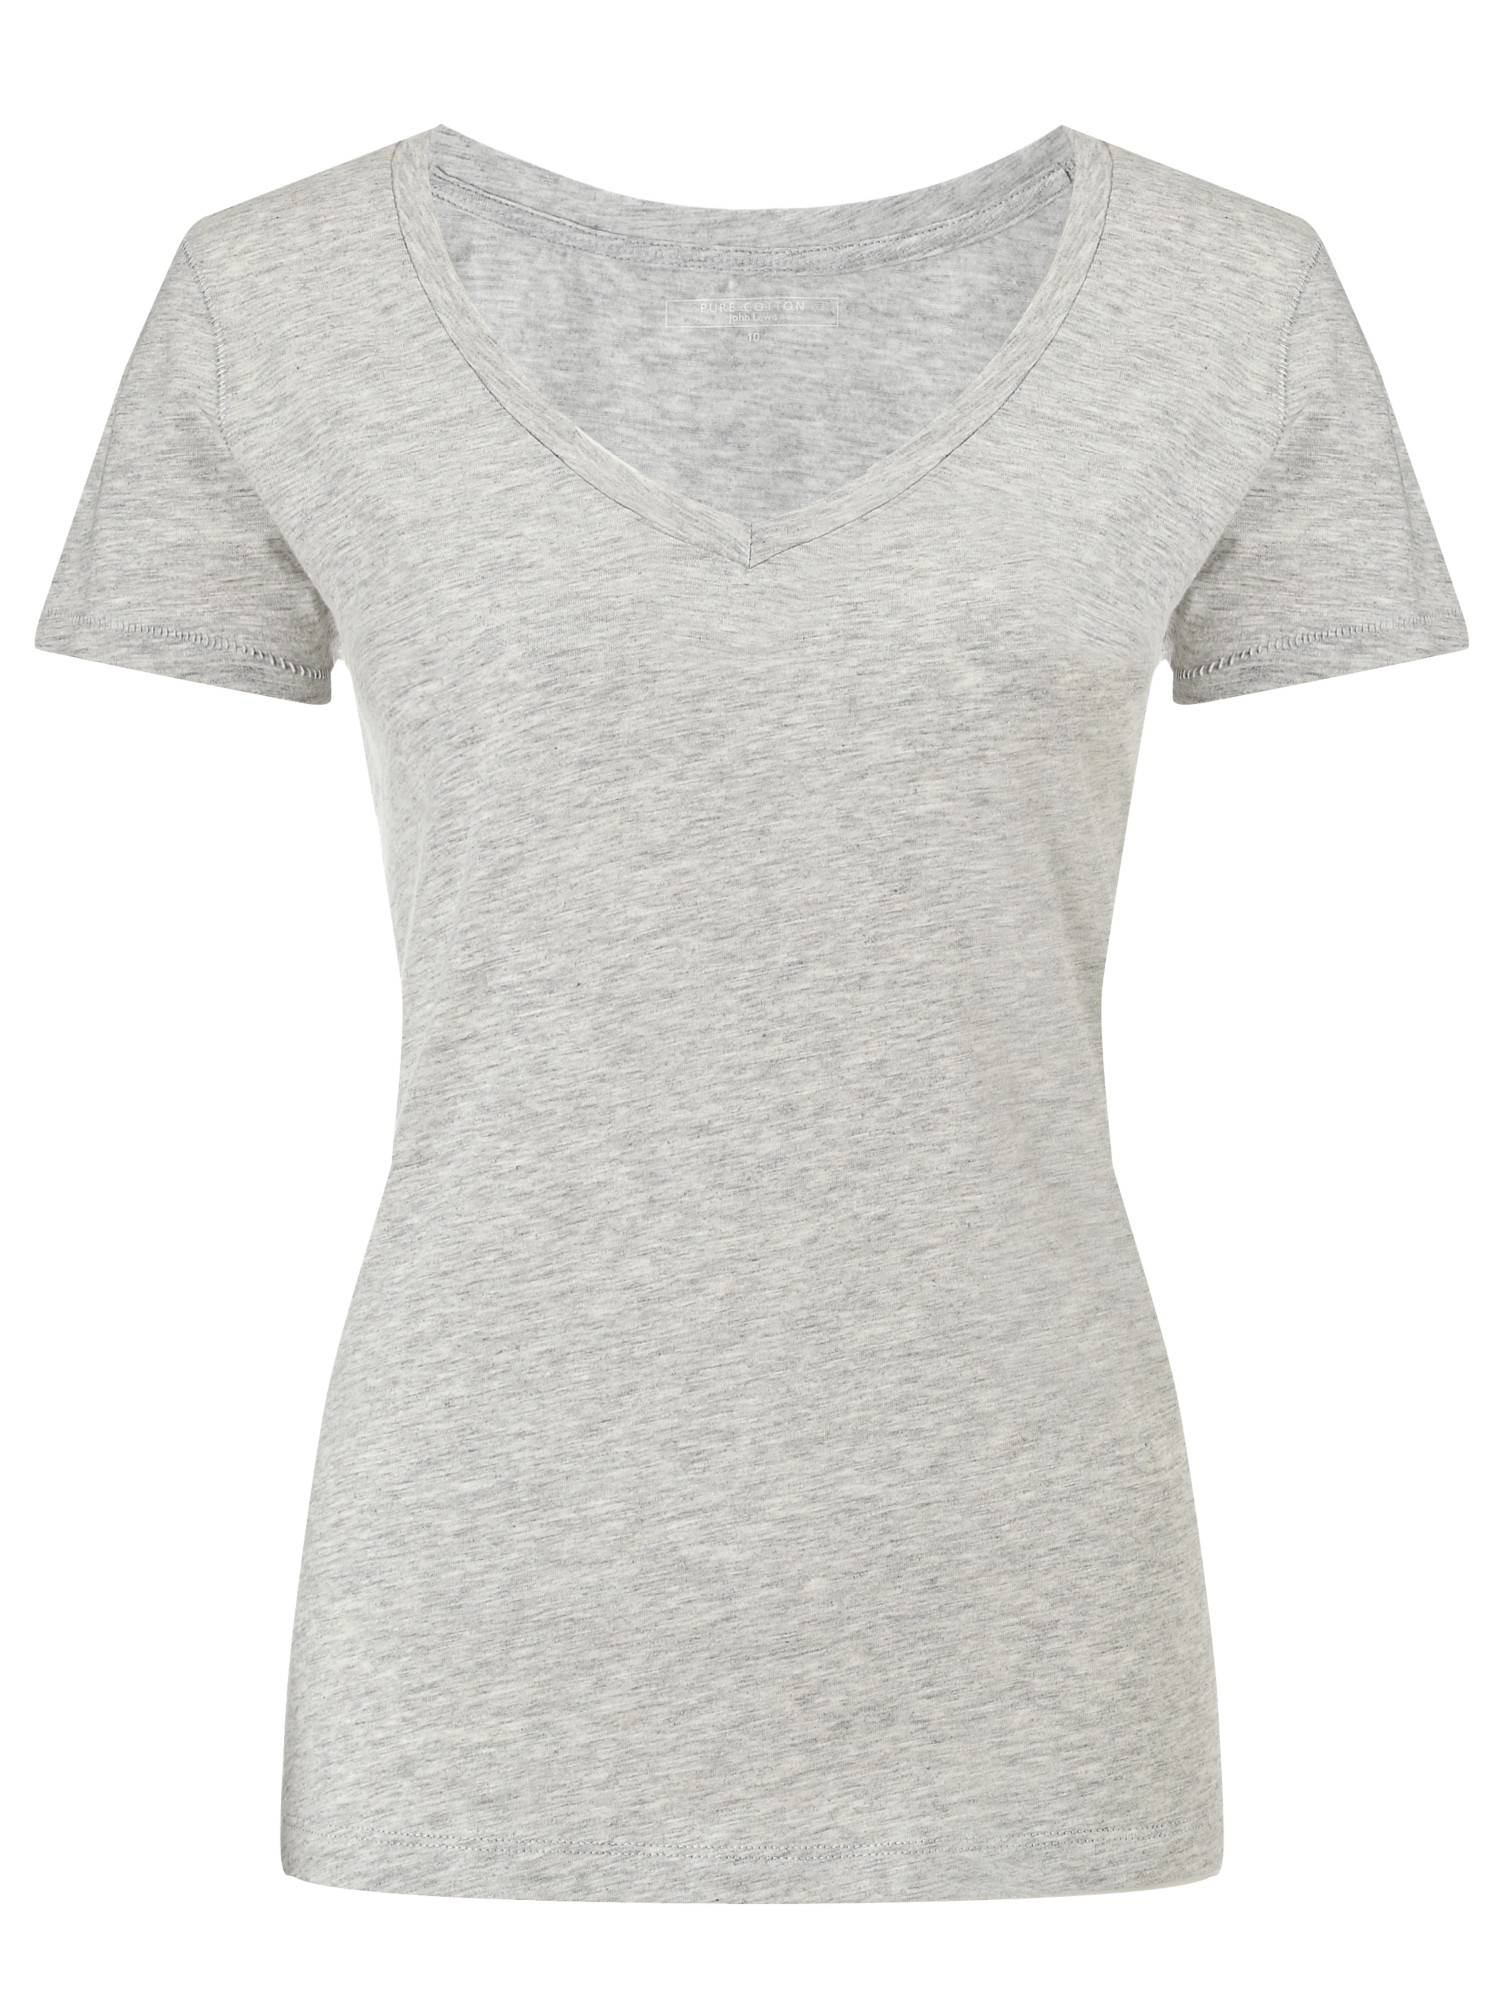 john lewis slub cotton v neck t shirt in gray lyst. Black Bedroom Furniture Sets. Home Design Ideas